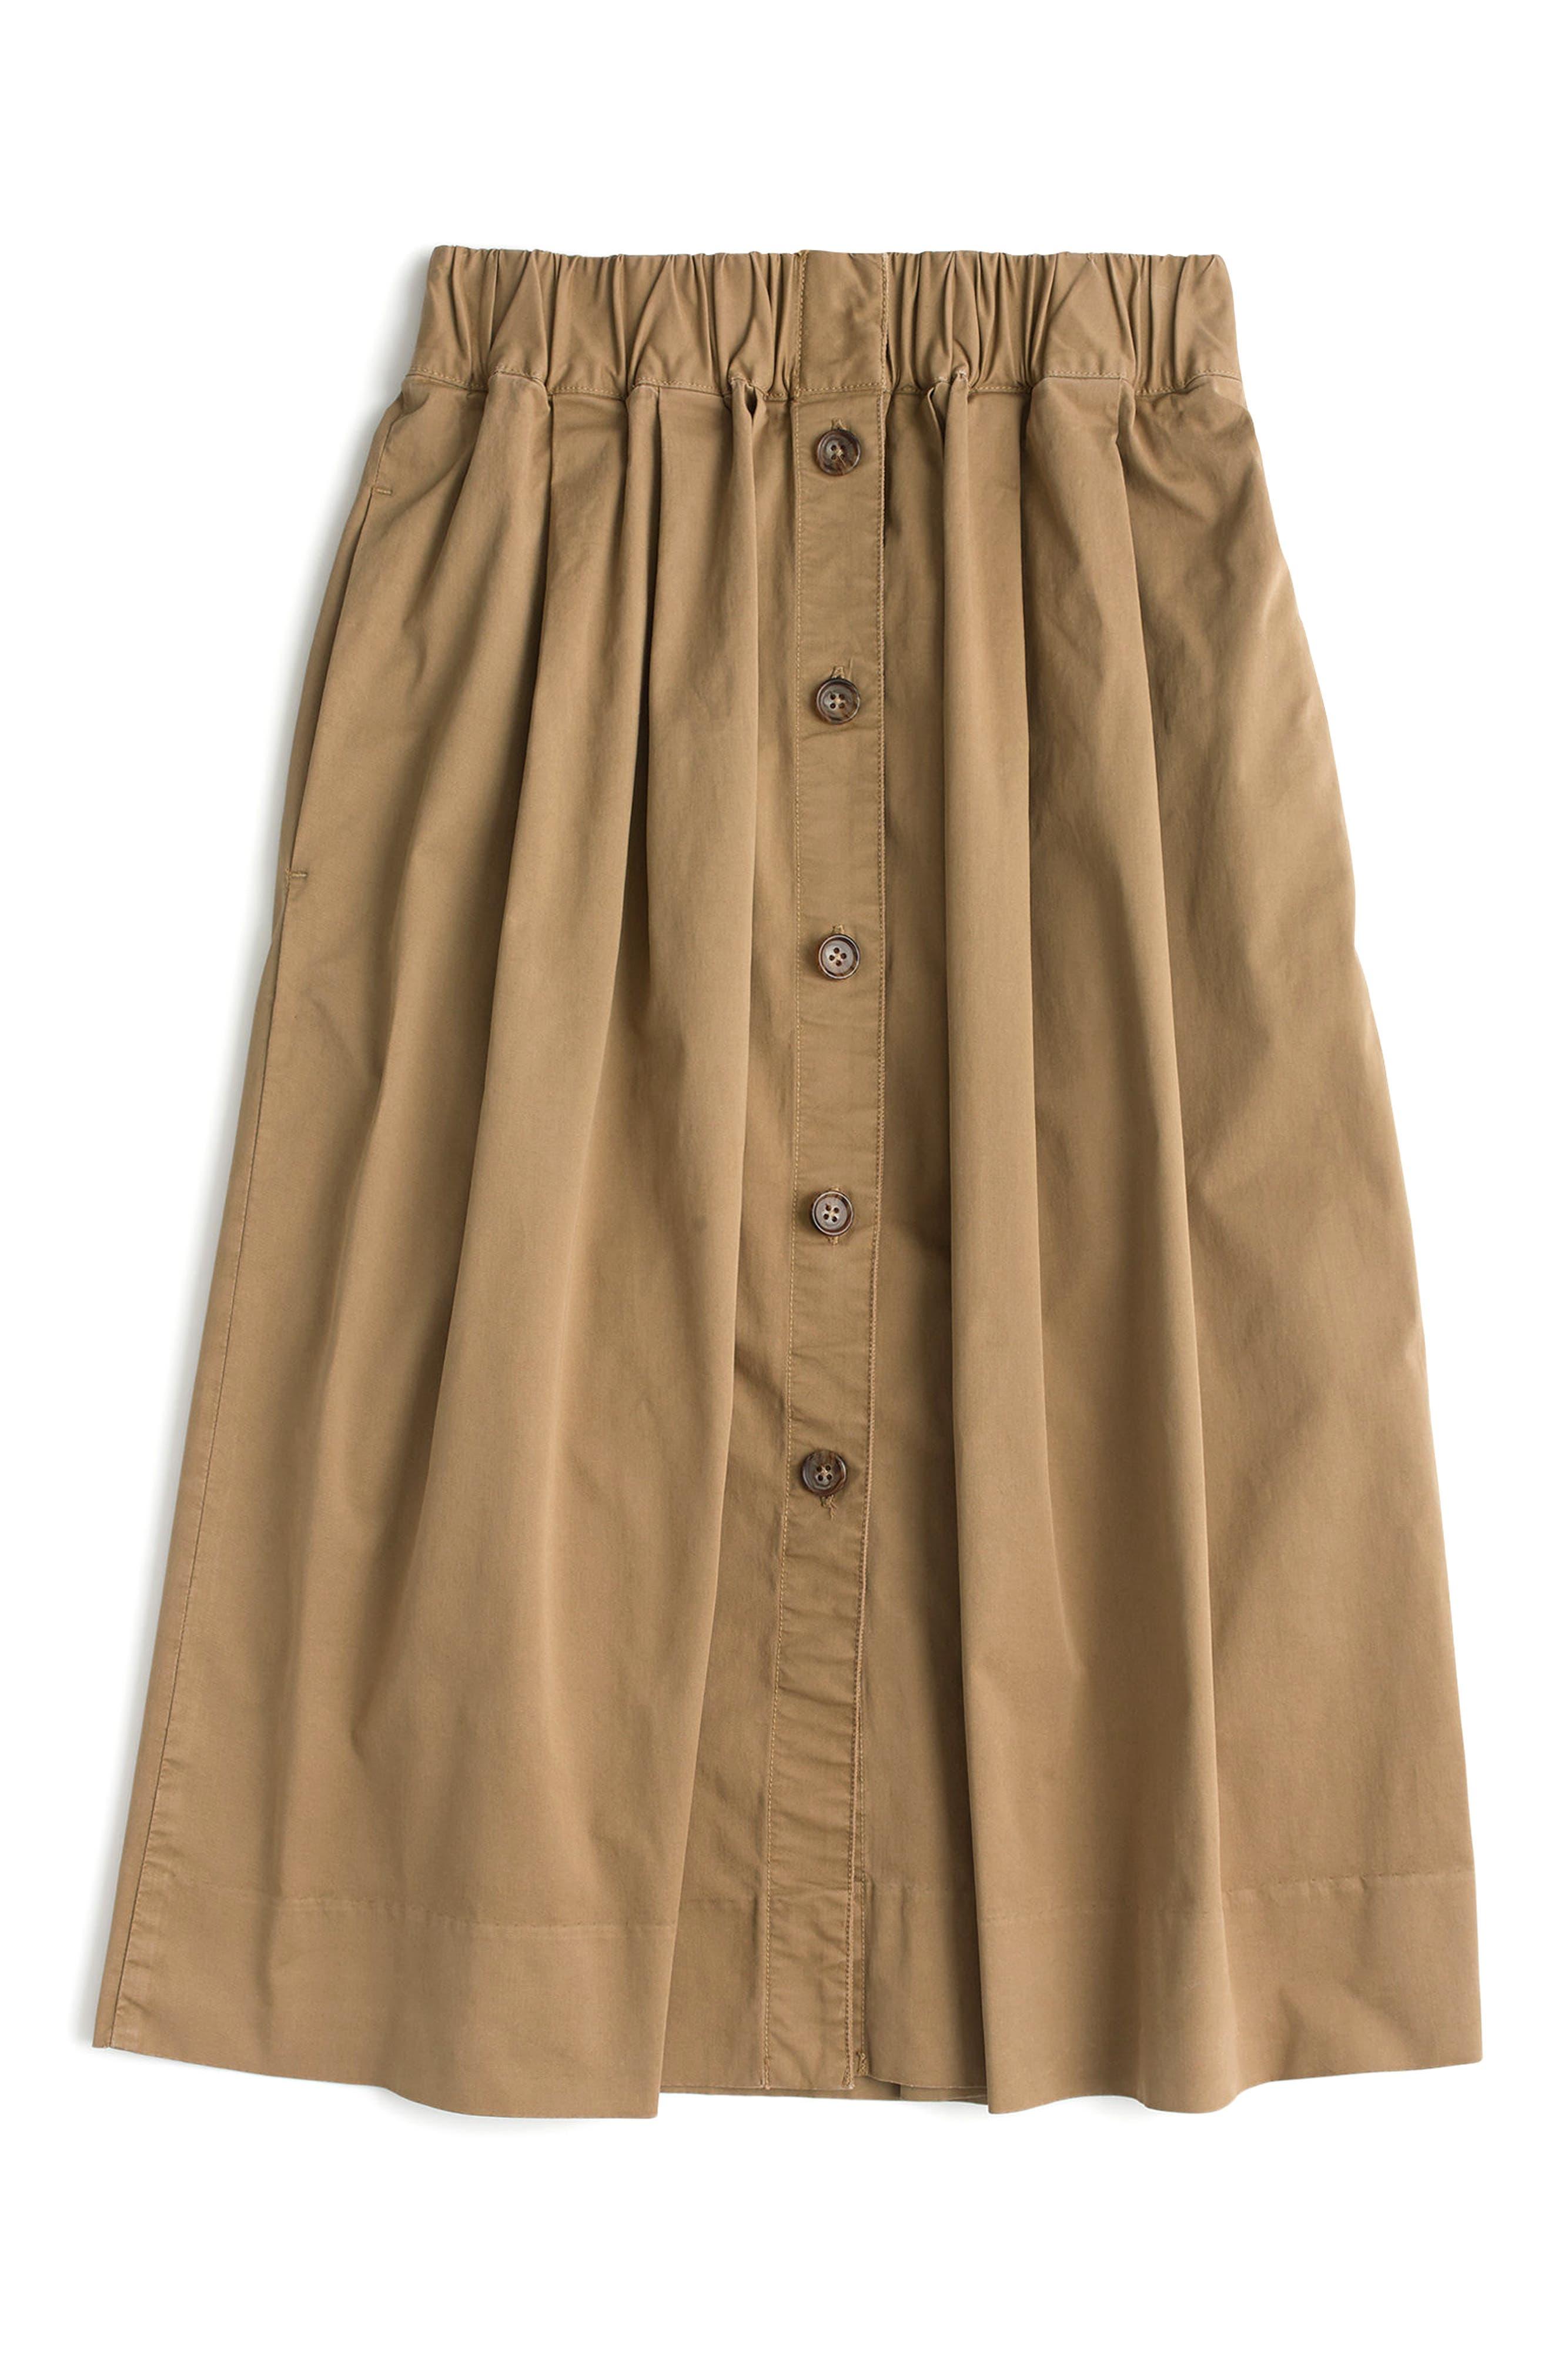 Alternate Image 3  - J.Crew Button Front Chino Skirt (Regular & Petite)